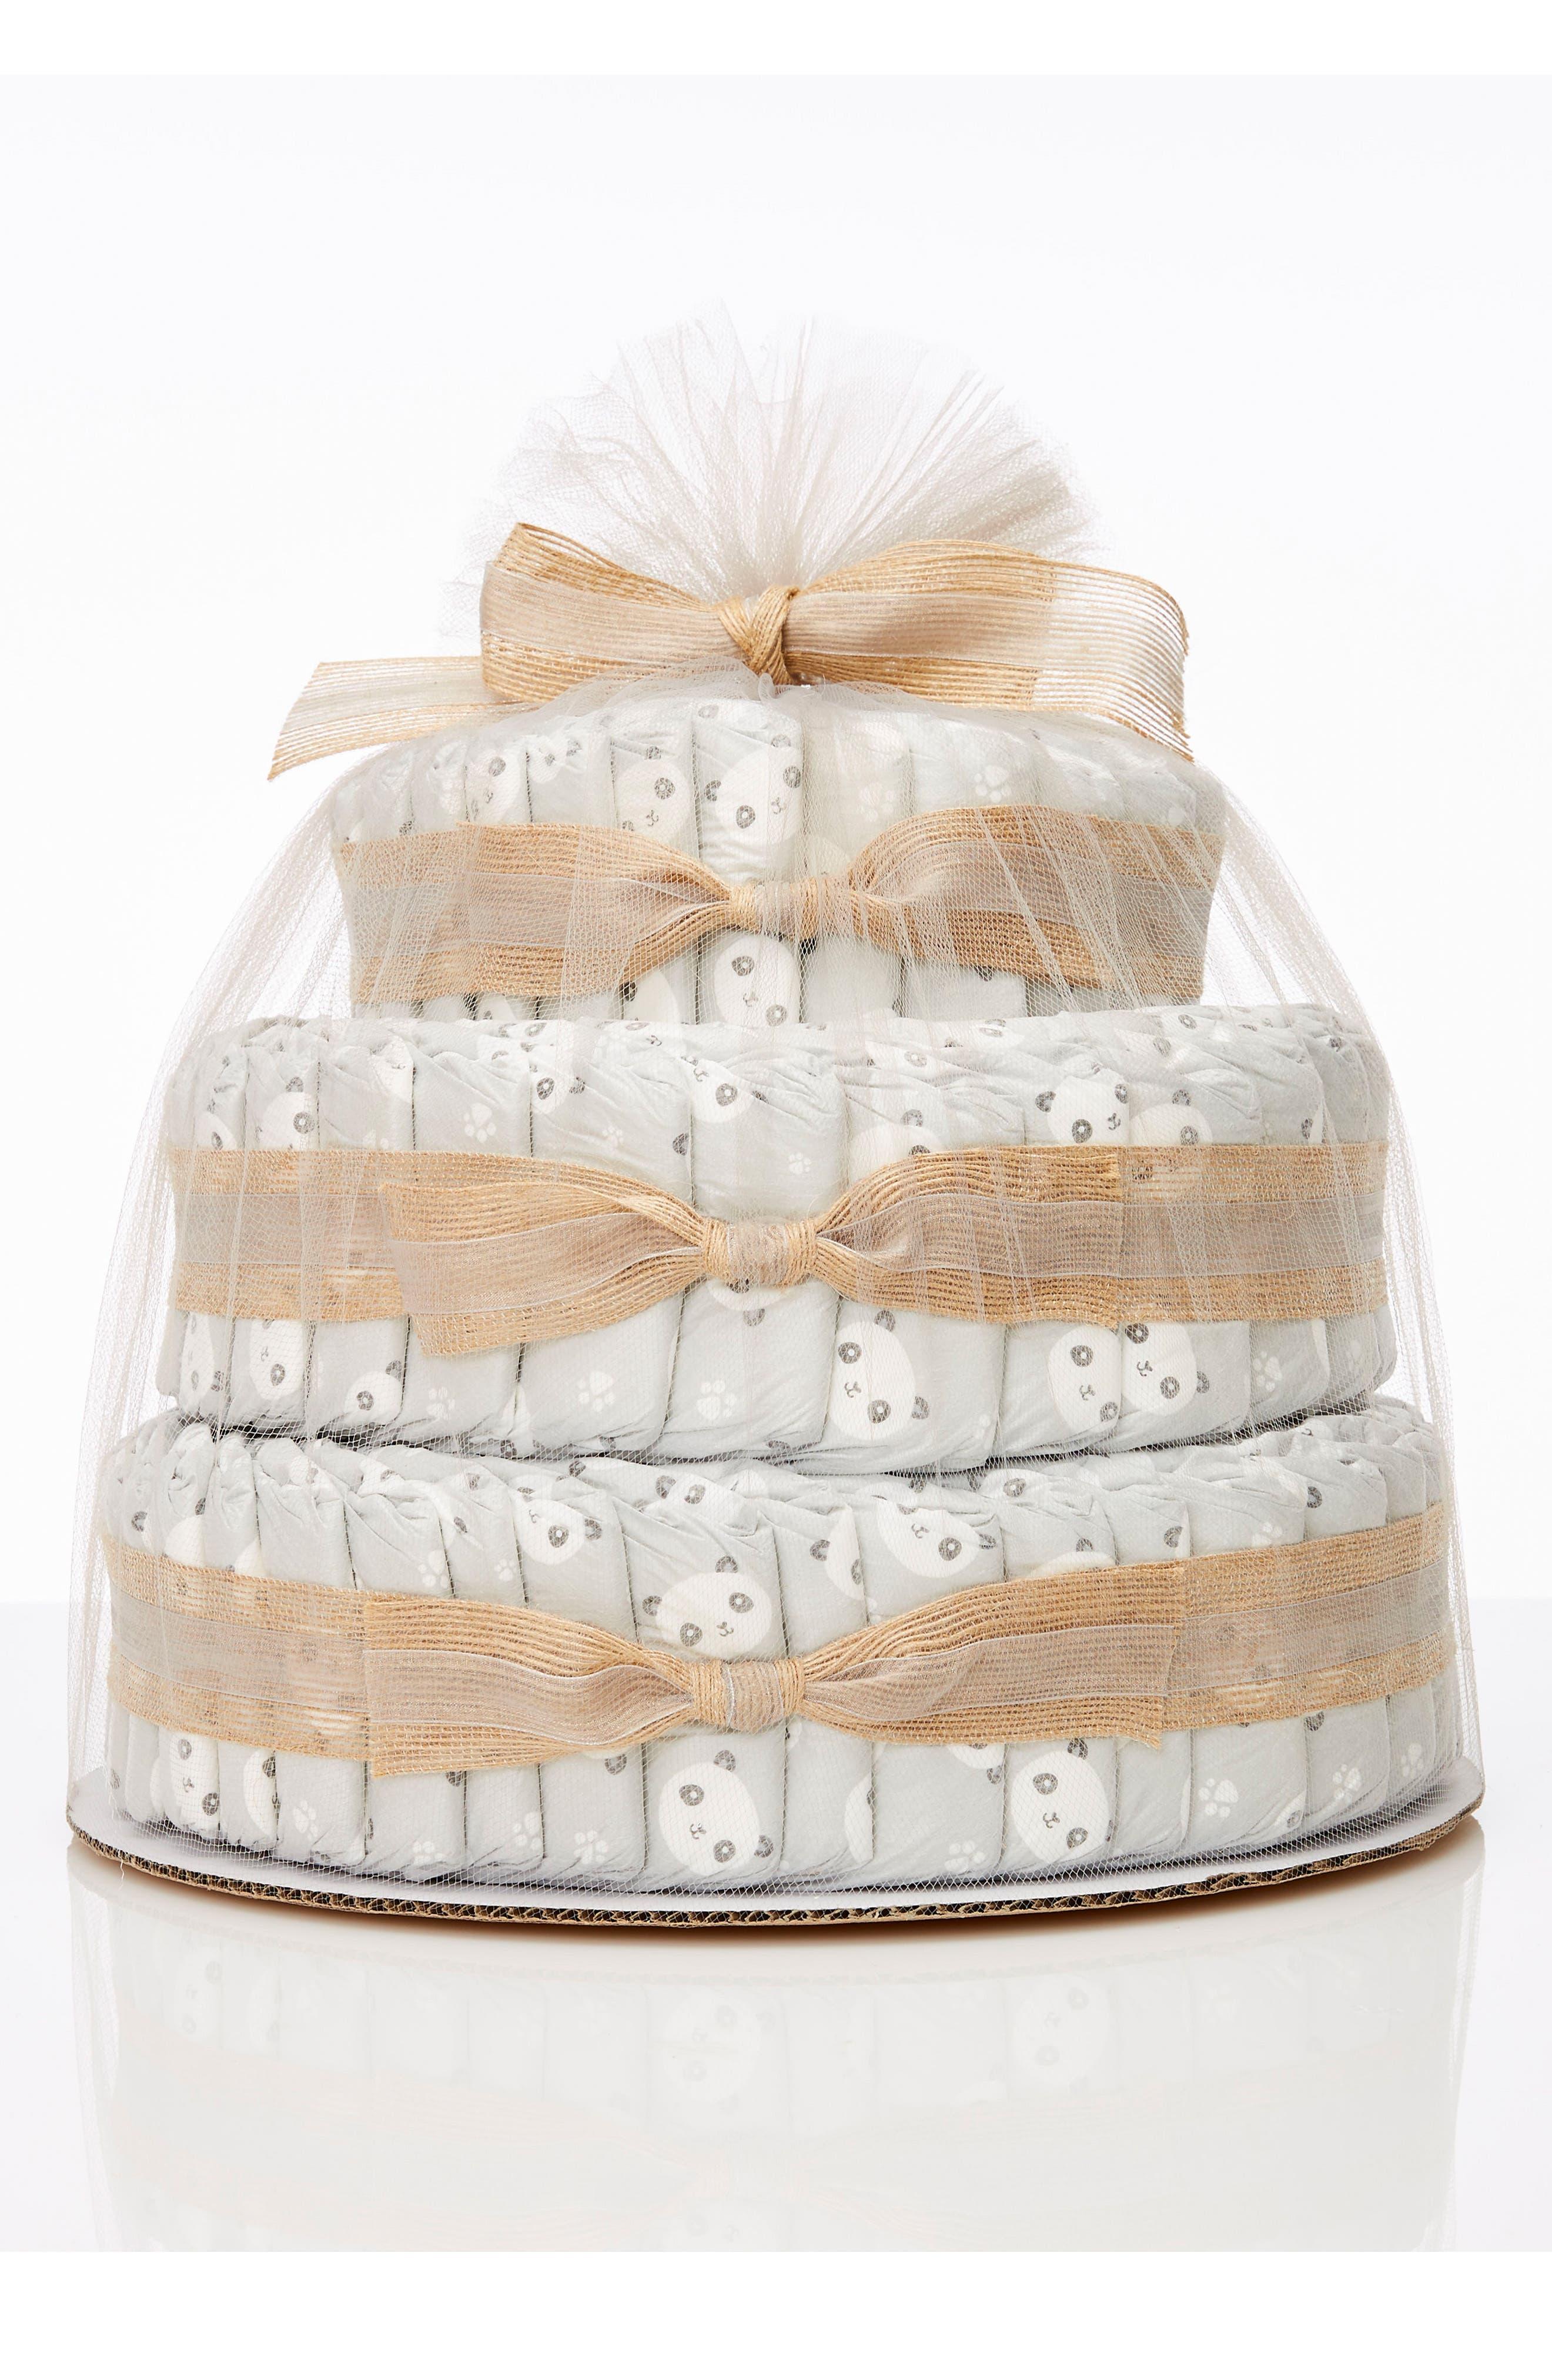 THE HONEST COMPANY, Large Diaper Cake & Full-Size Essentials Set, Main thumbnail 1, color, PANDAS